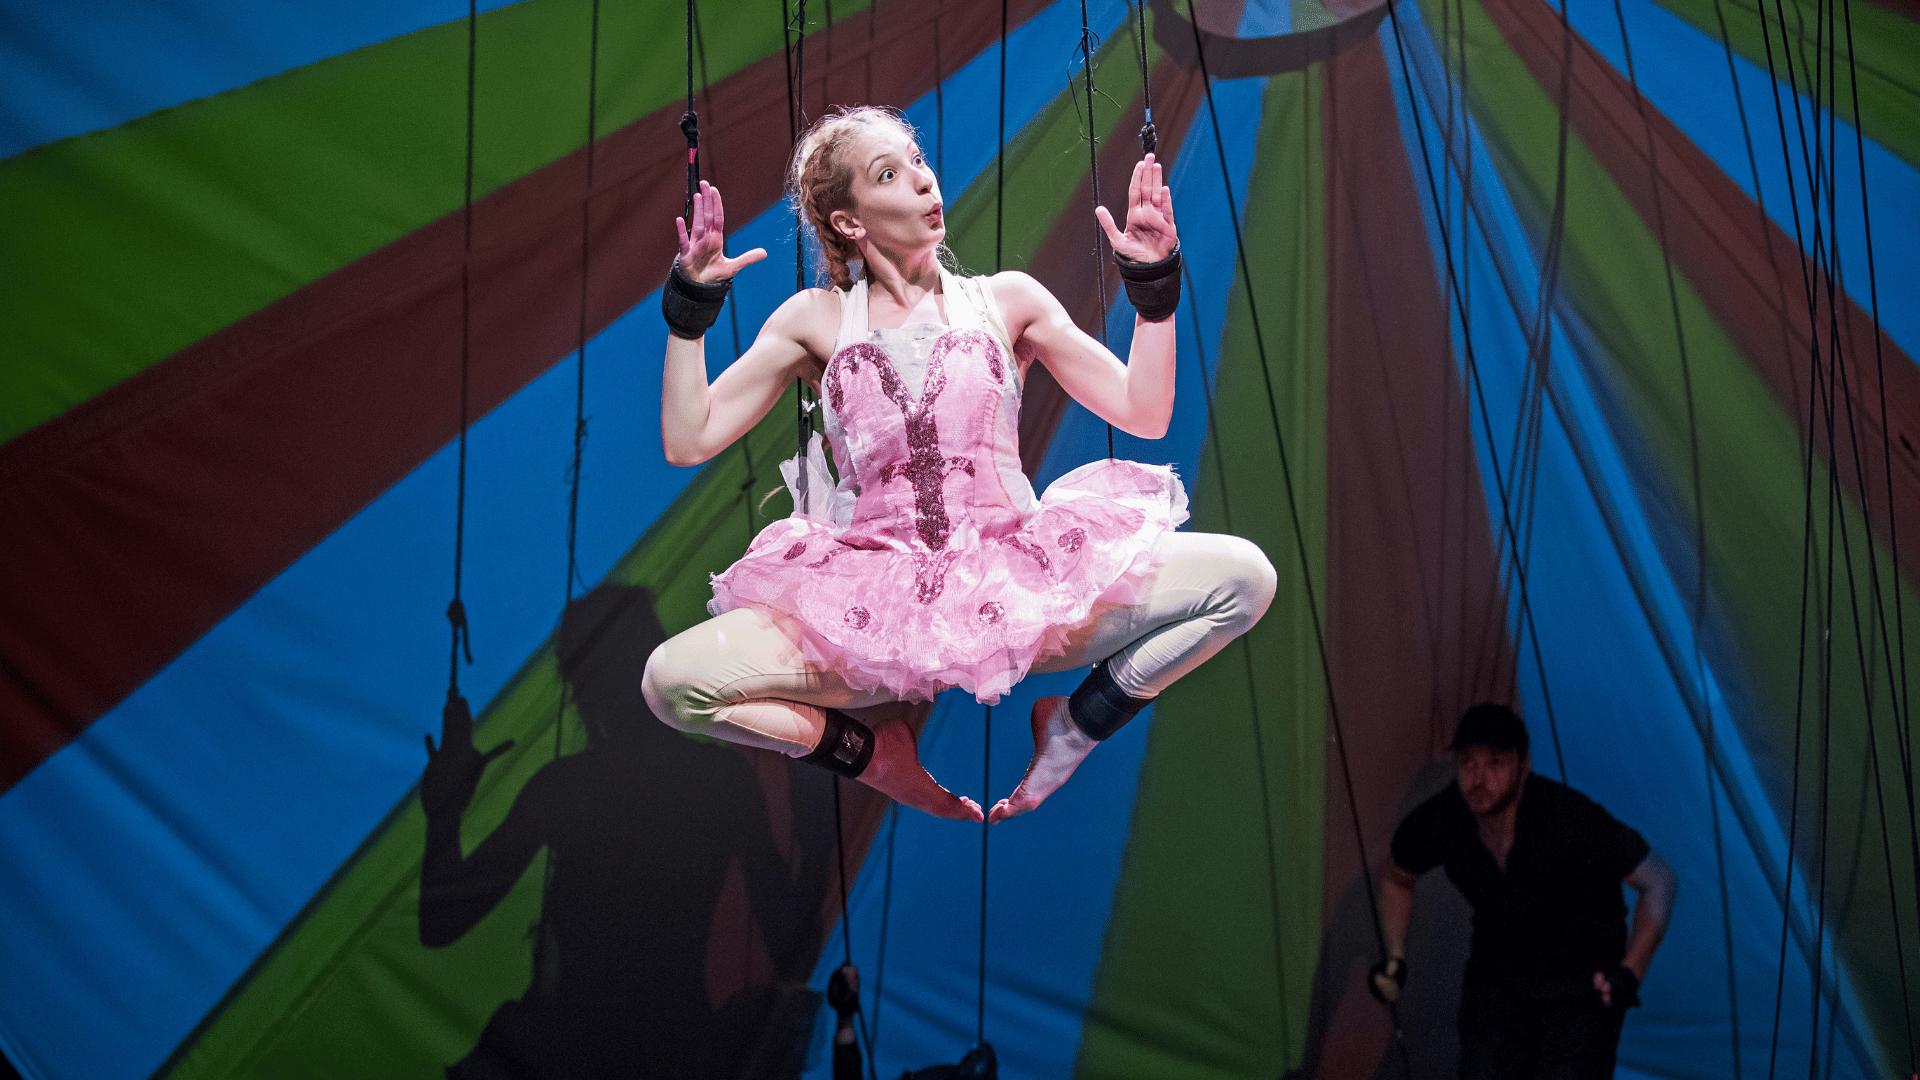 JVC' Pinocchio, featuring dancer Stefania Sotiropoulou